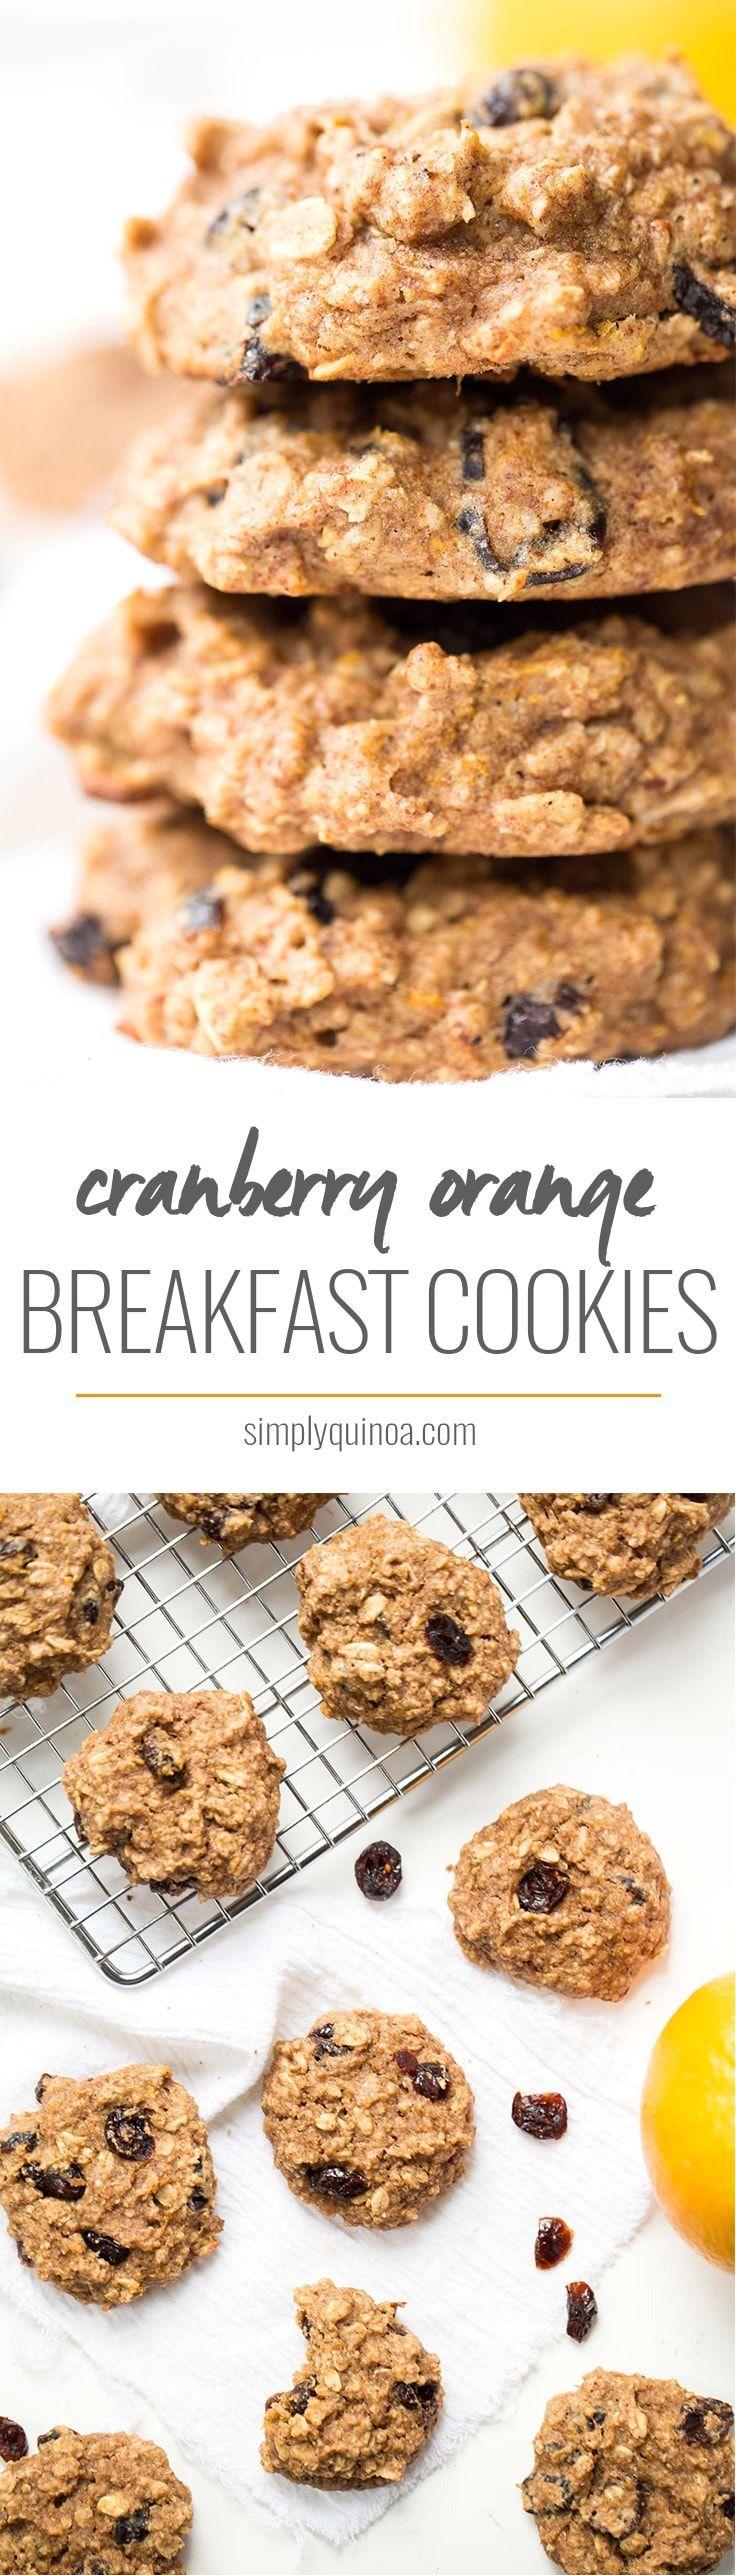 These AMAZING cranberry orange quinoa breakfast cookies have banana ...